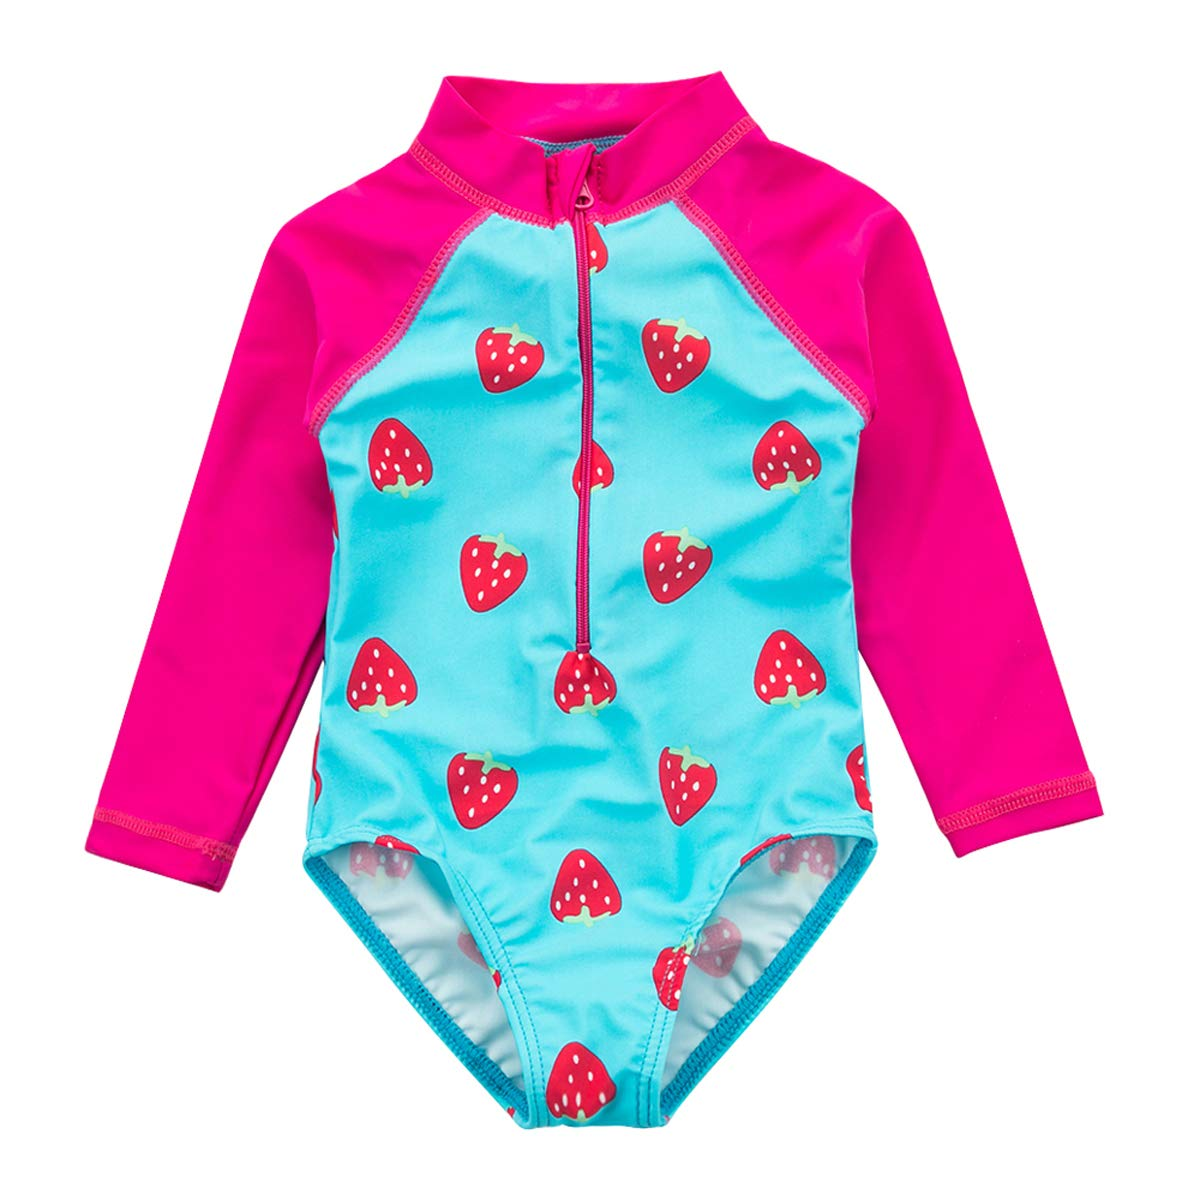 845fbe75e04d Baby Kid Girl Swimsuits Bathing Polka Dots Bowknot Swimwear Tankini ...